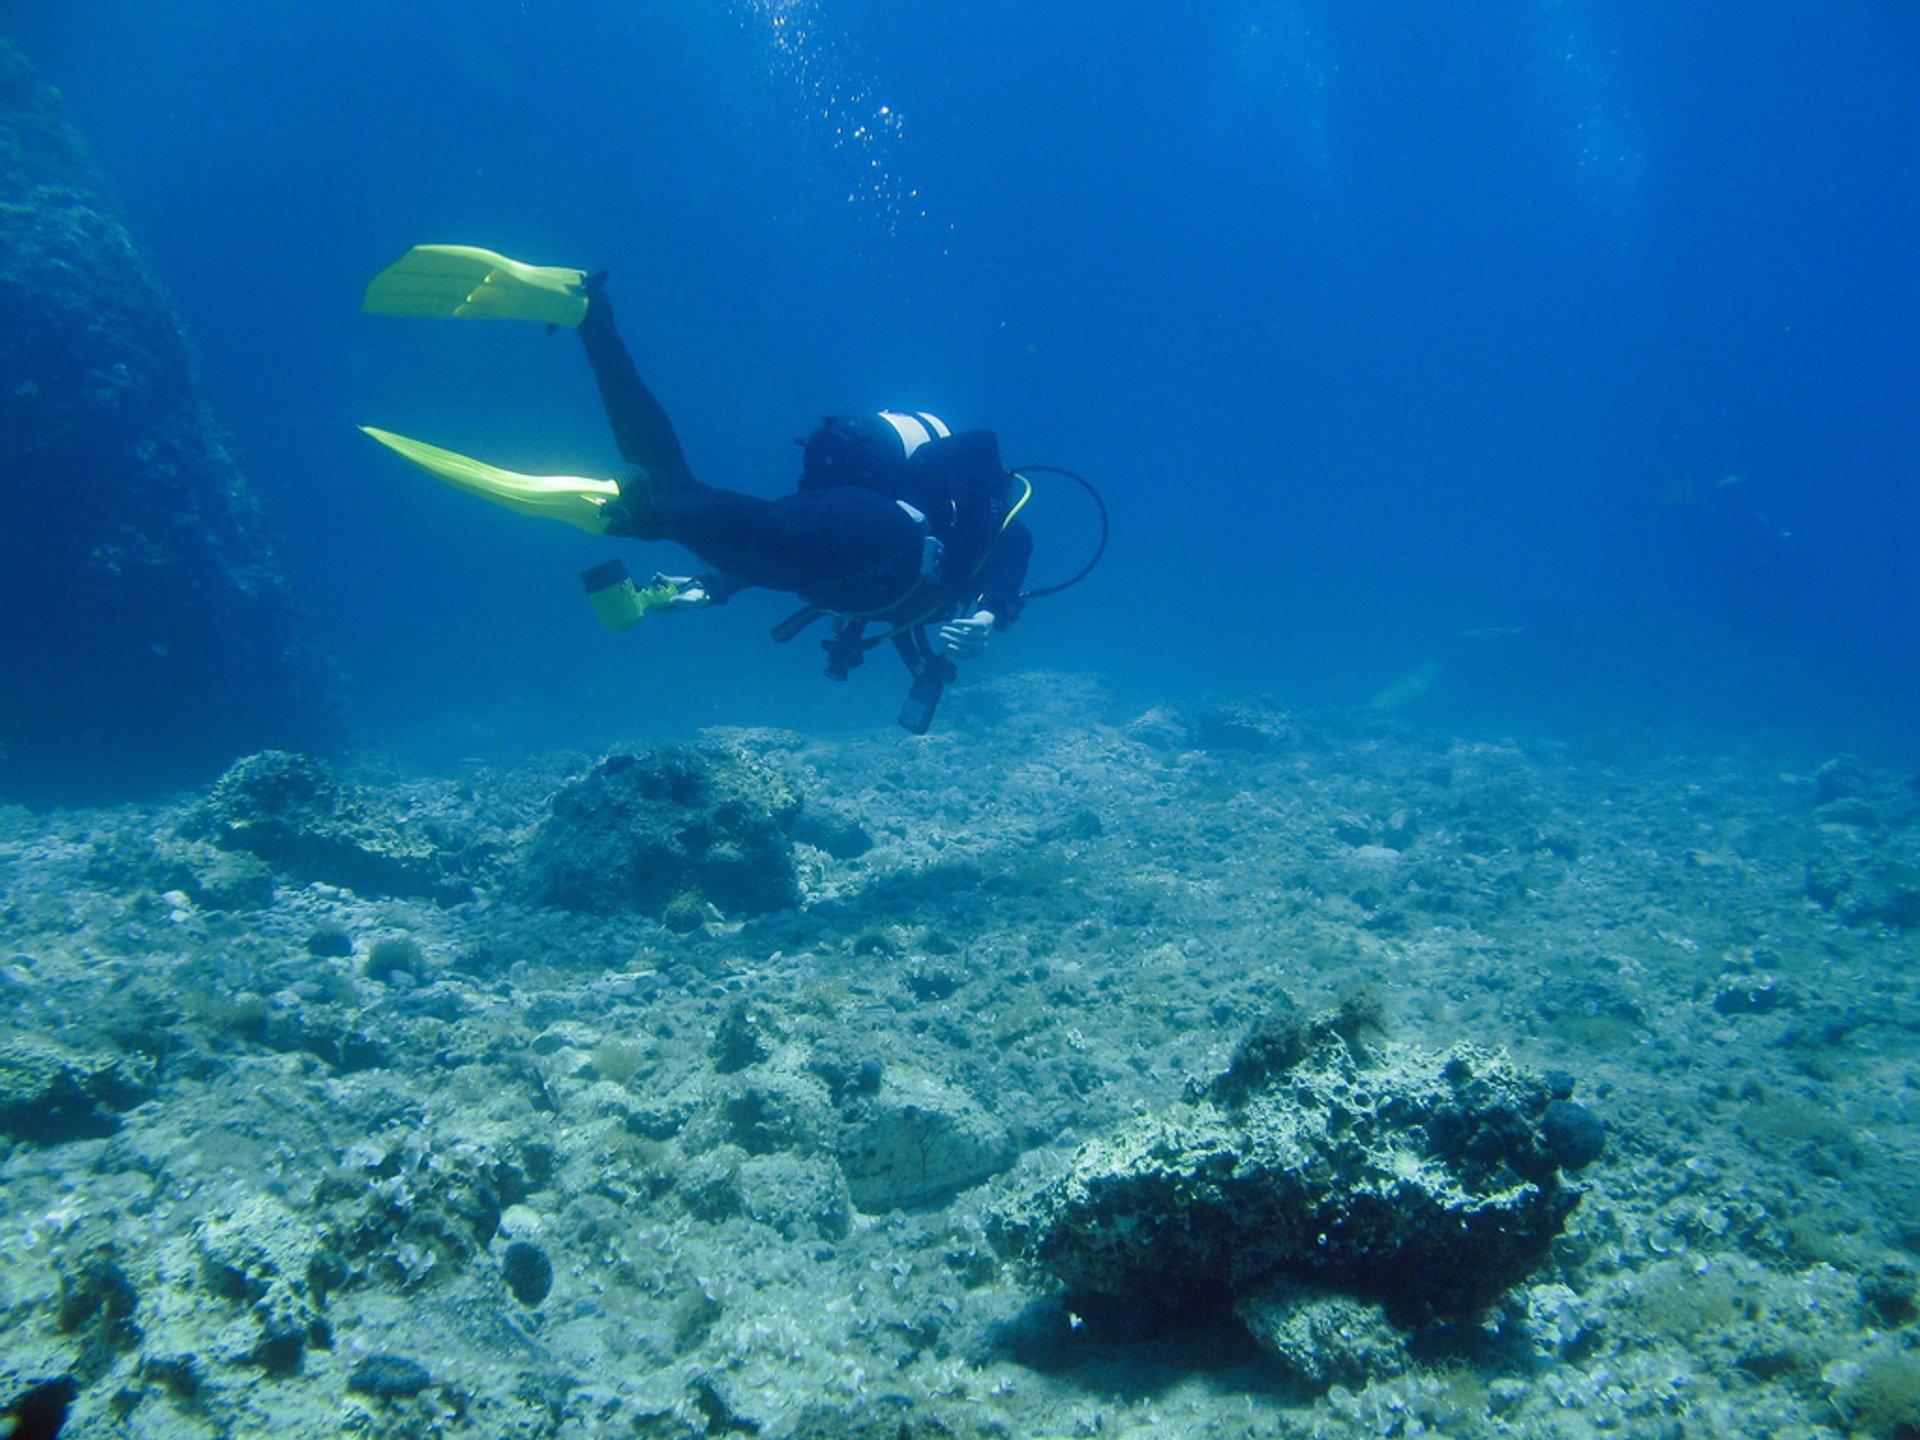 Diving in Croatia 2019 - Best Time